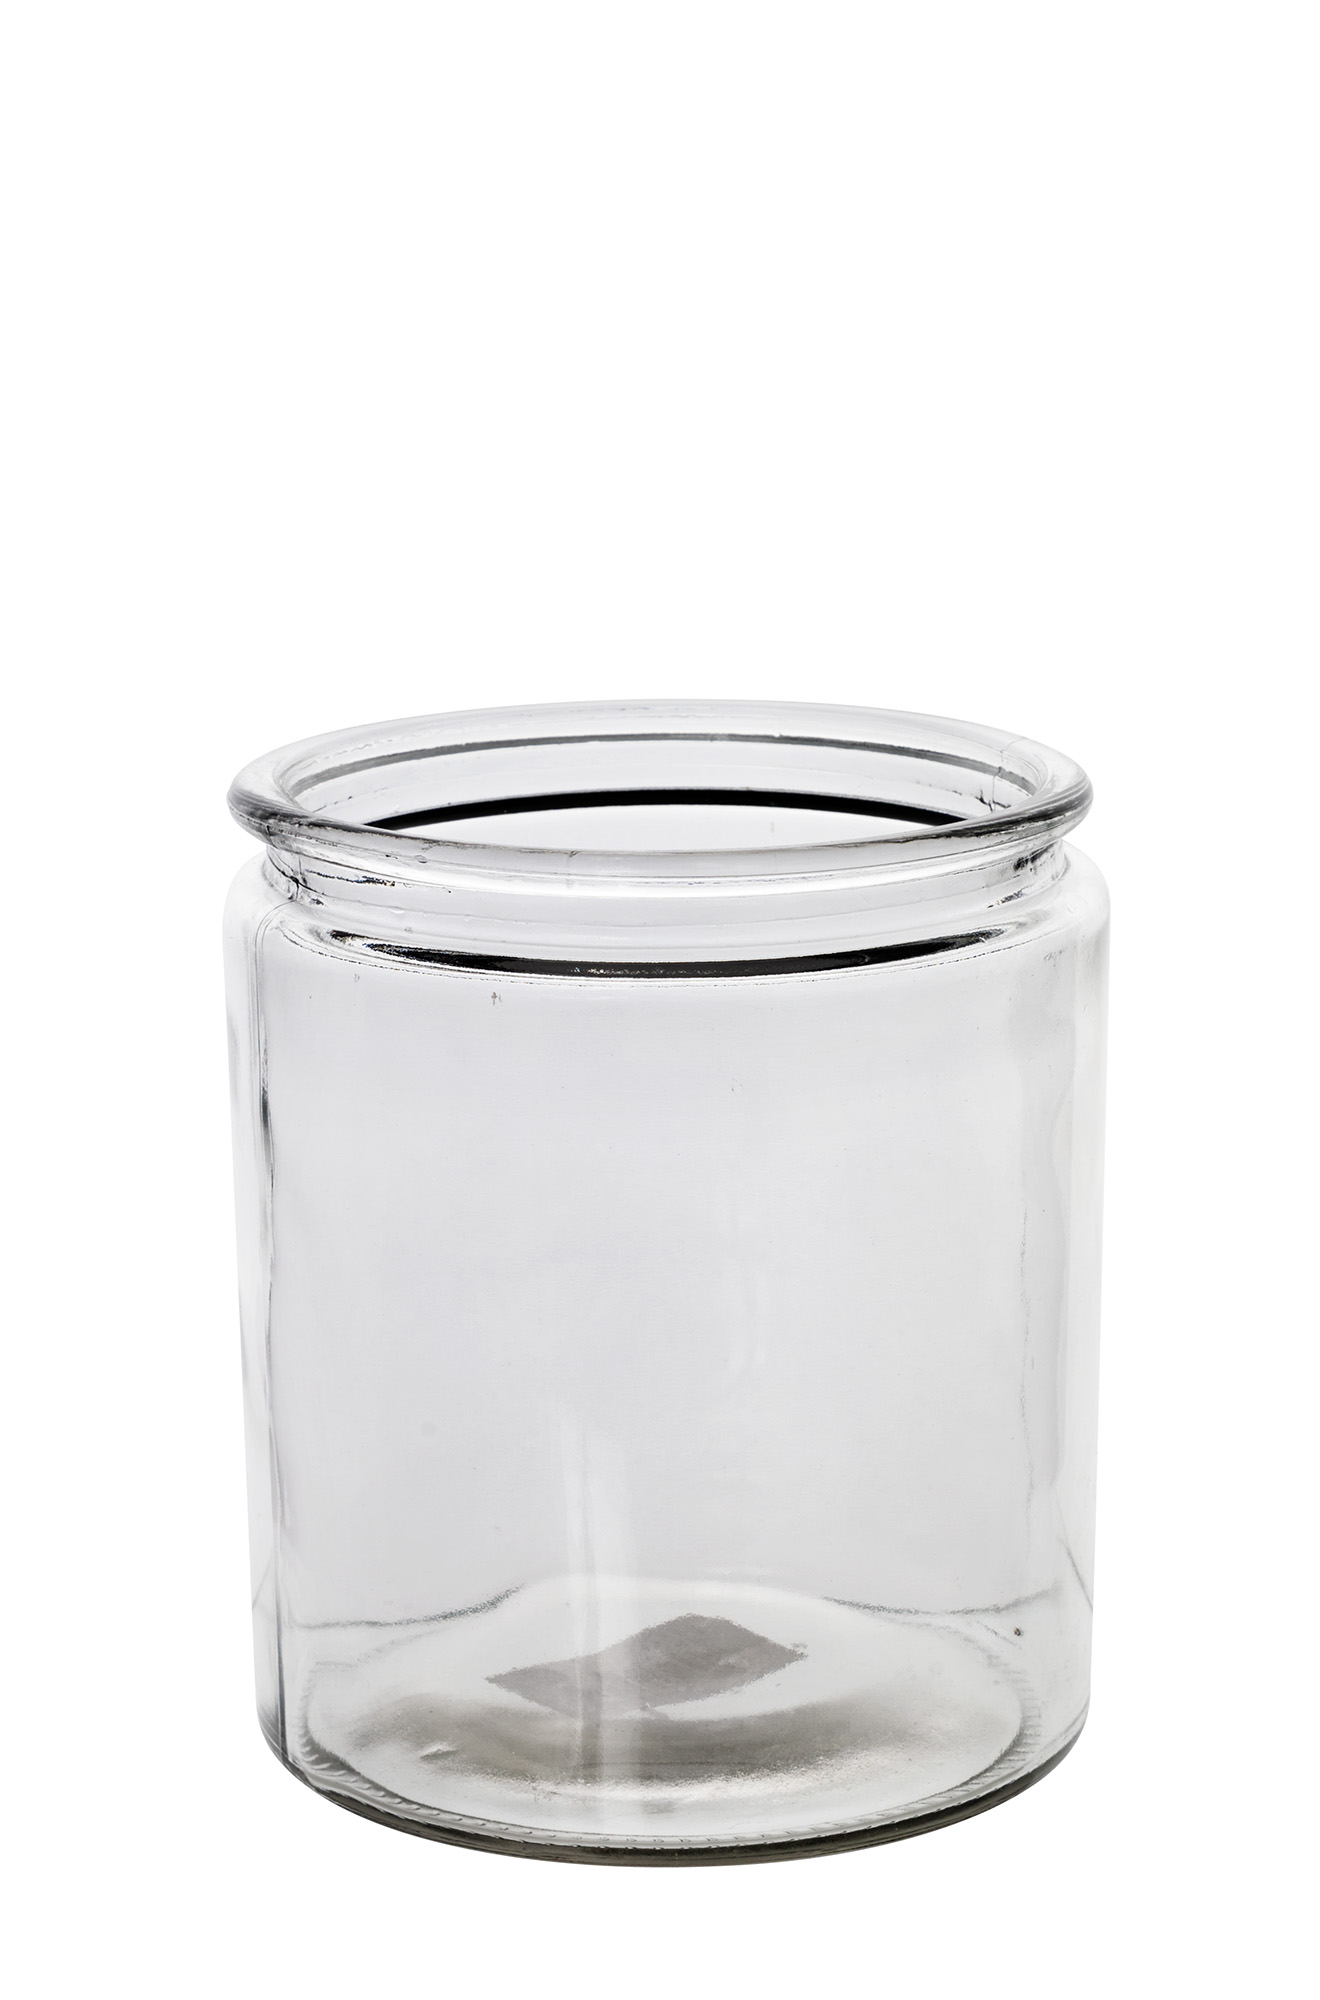 Glasvas återbruk